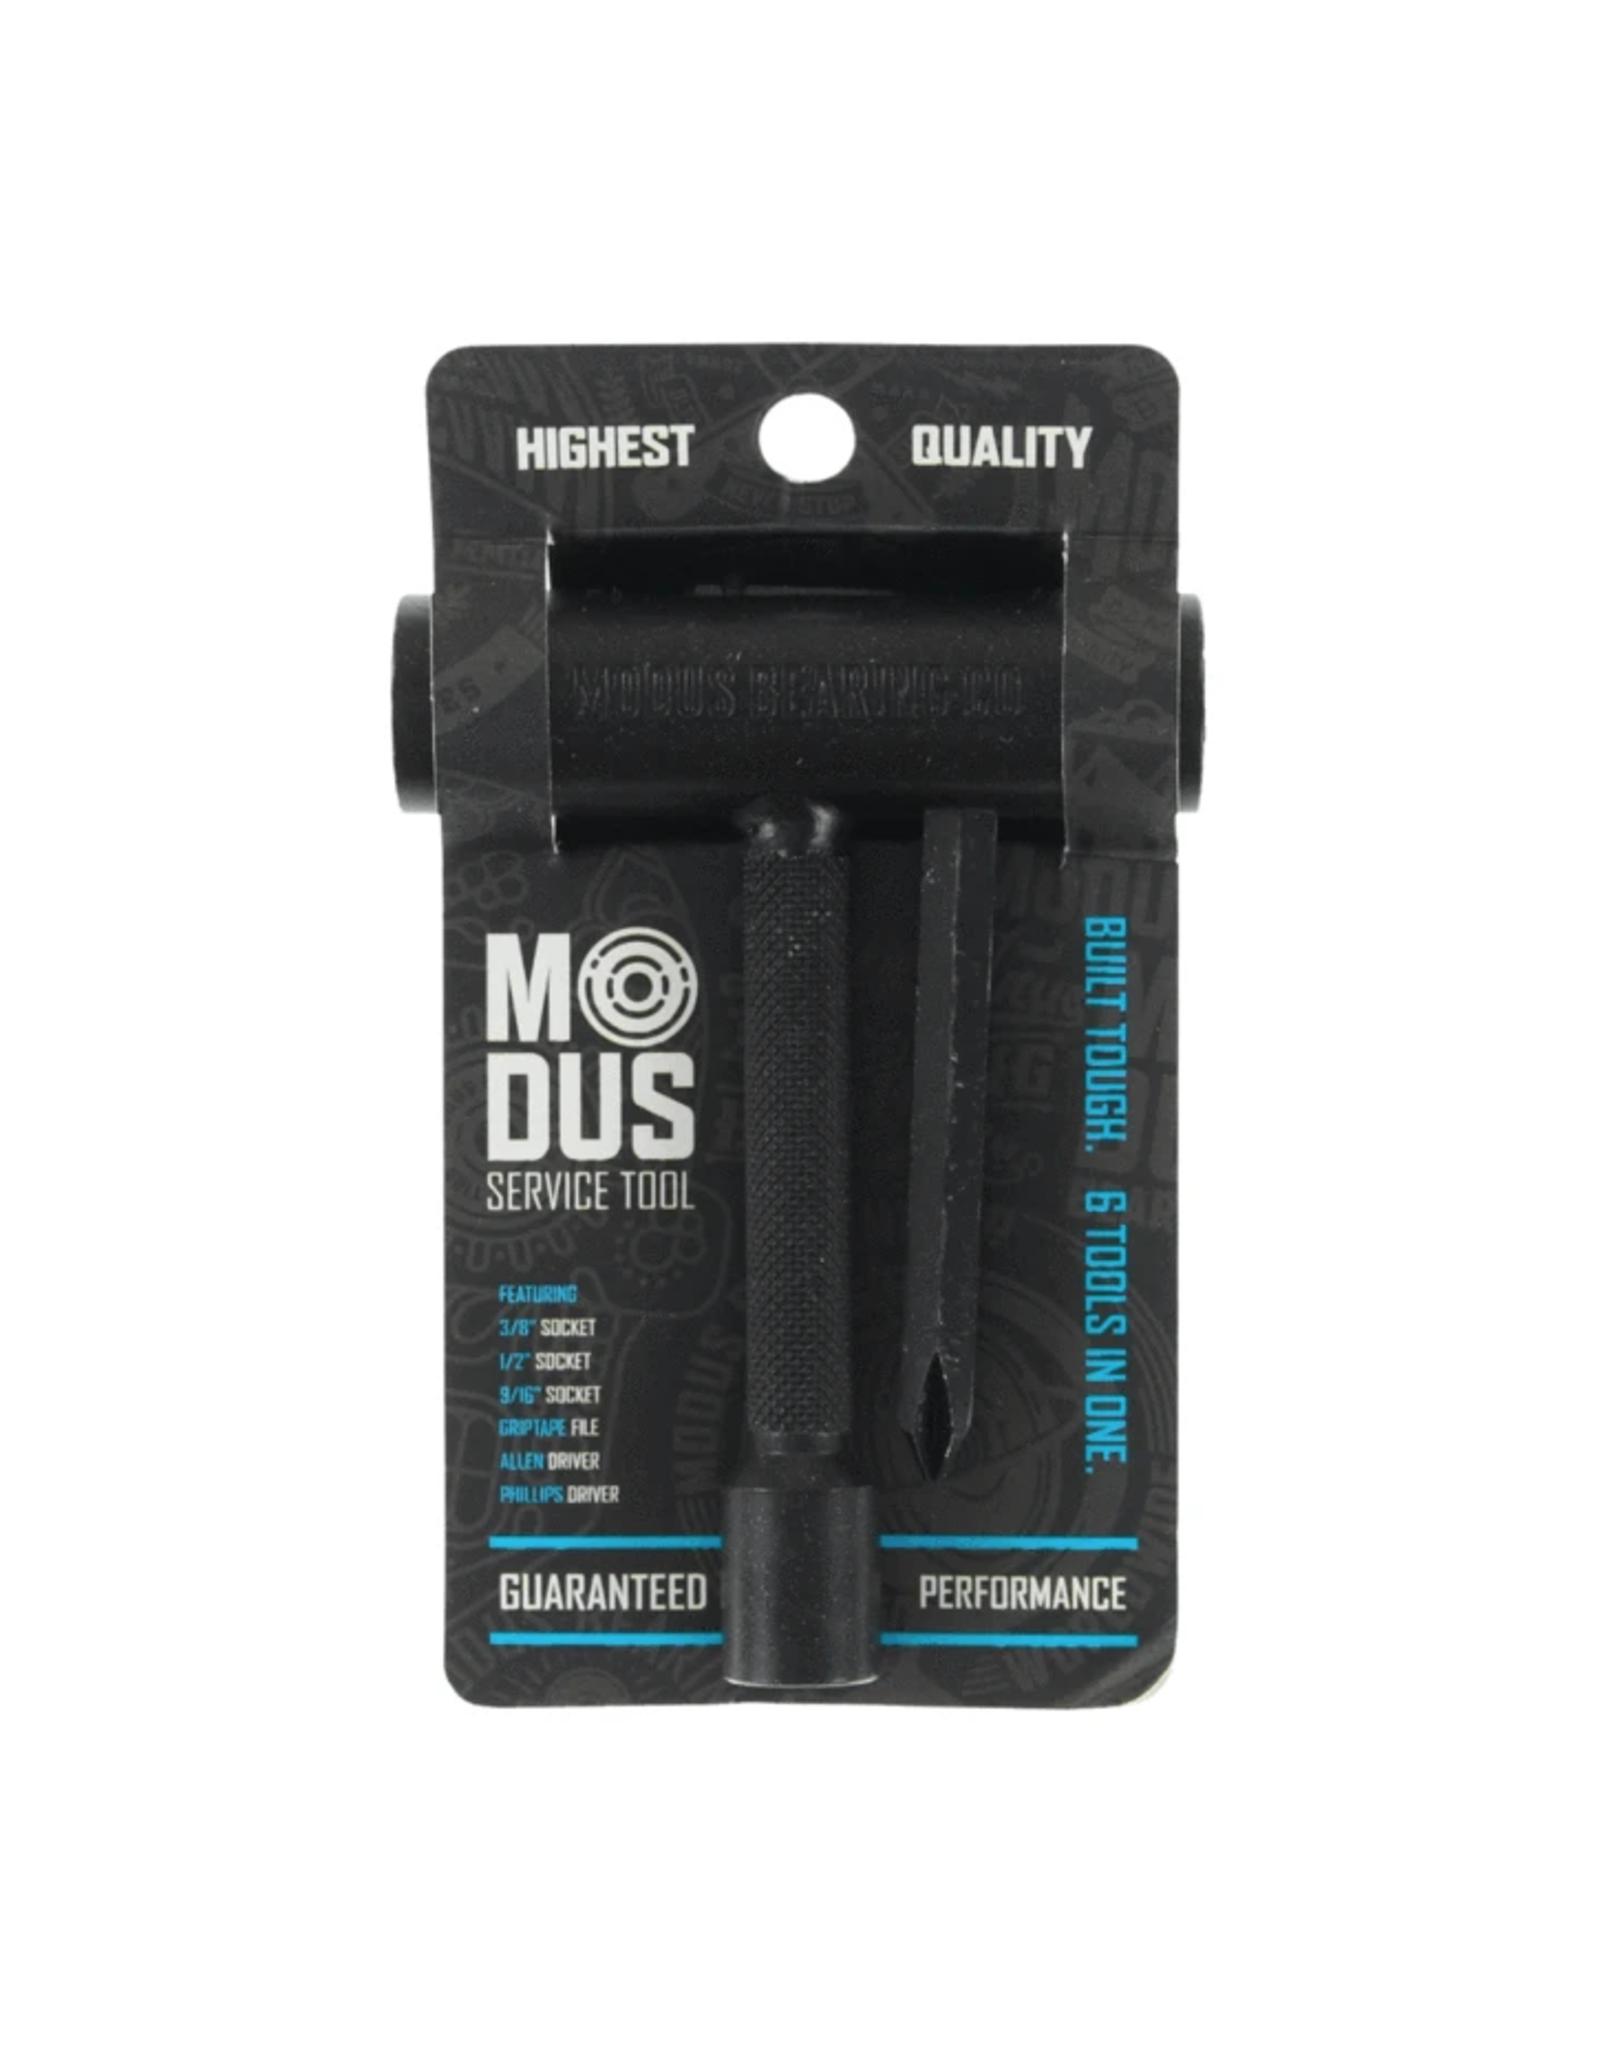 Modus Service Tools - Metal Black